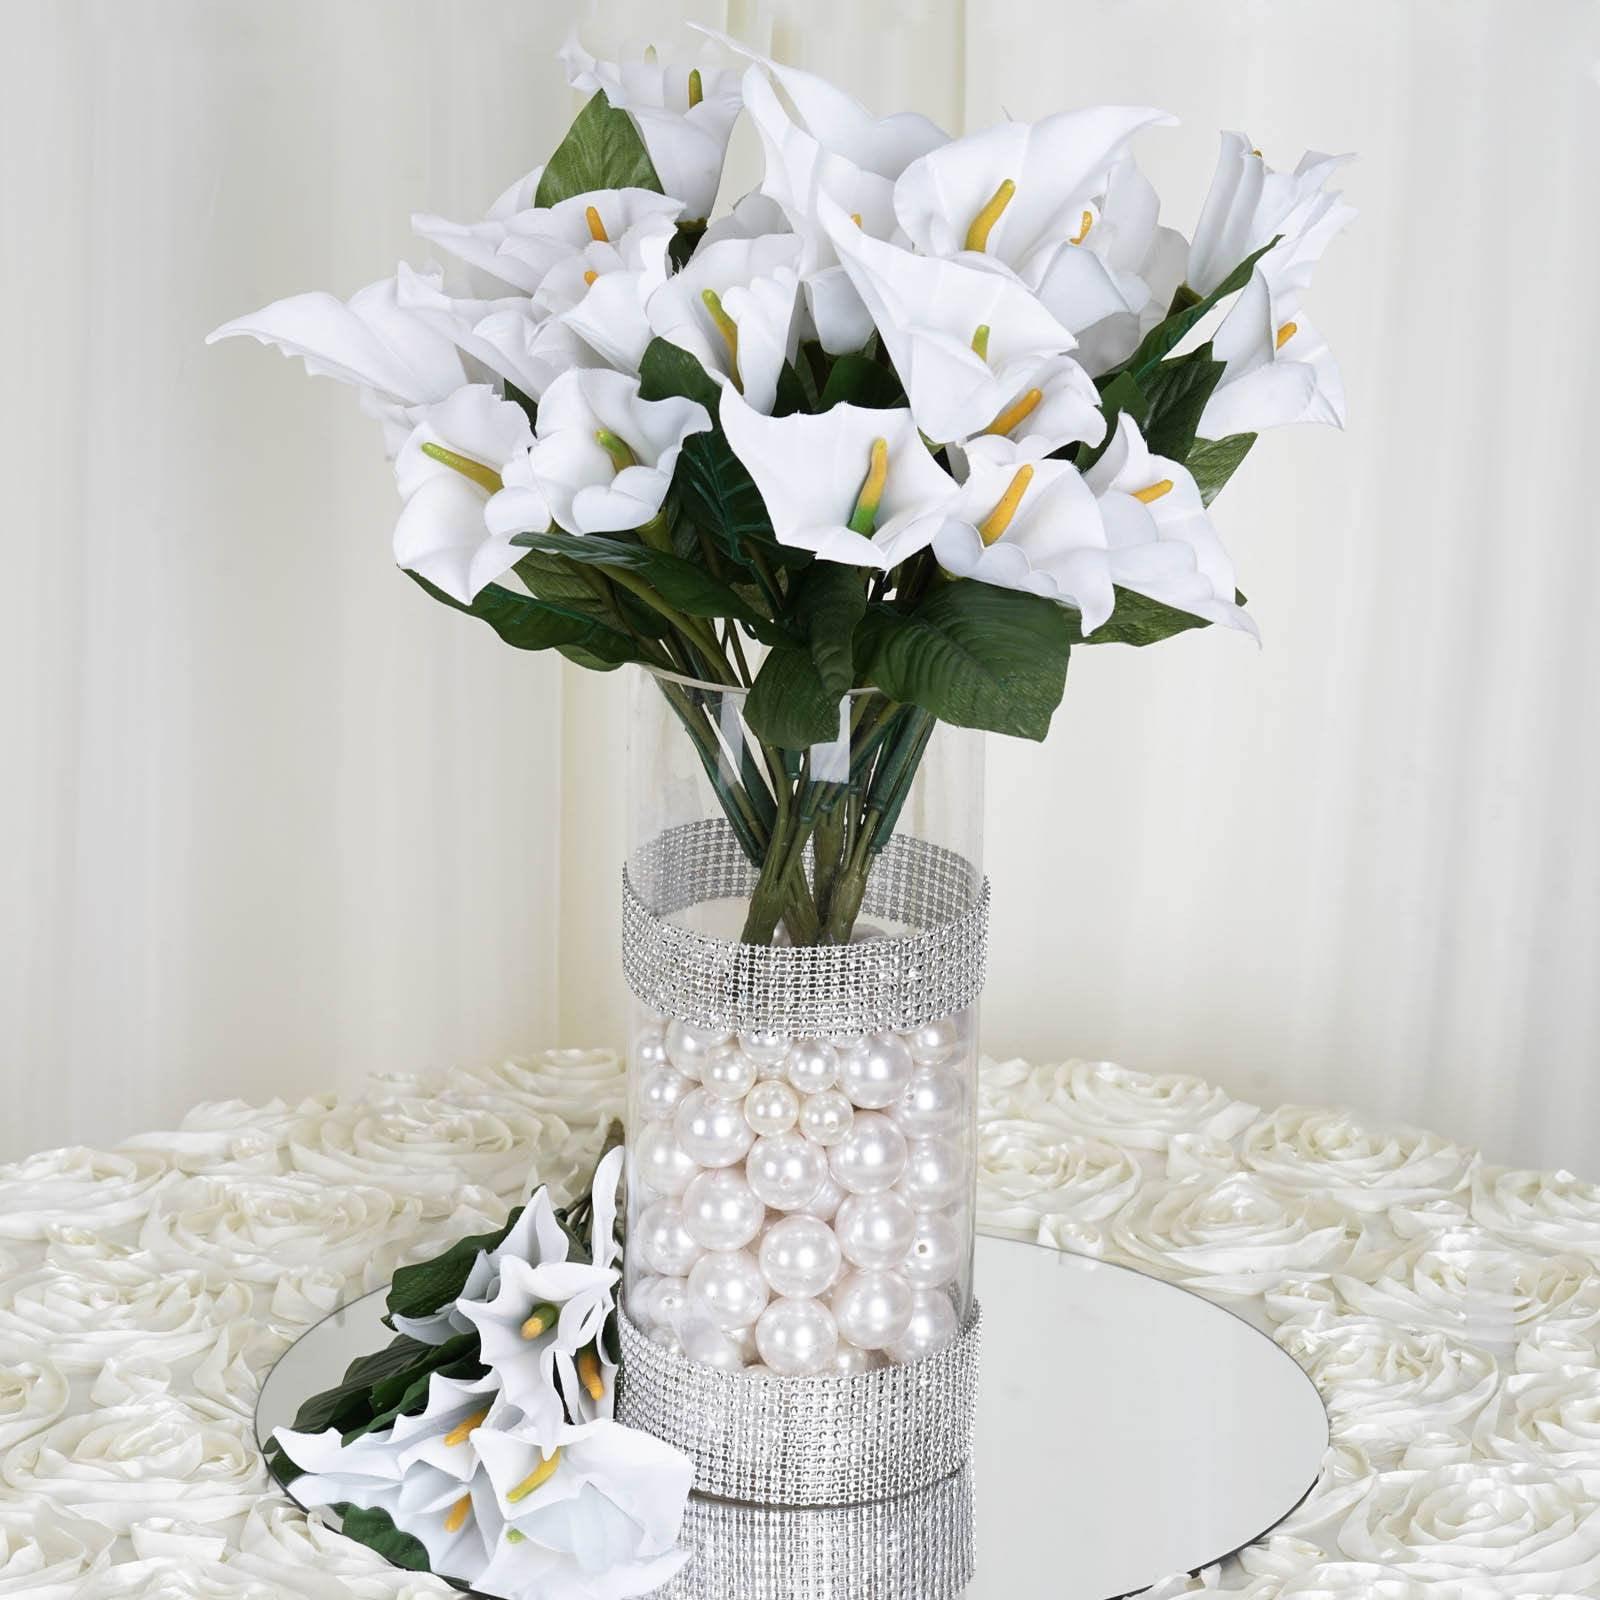 Efavormart 84 Artificial Calla Lily Flowers For Diy Wedding